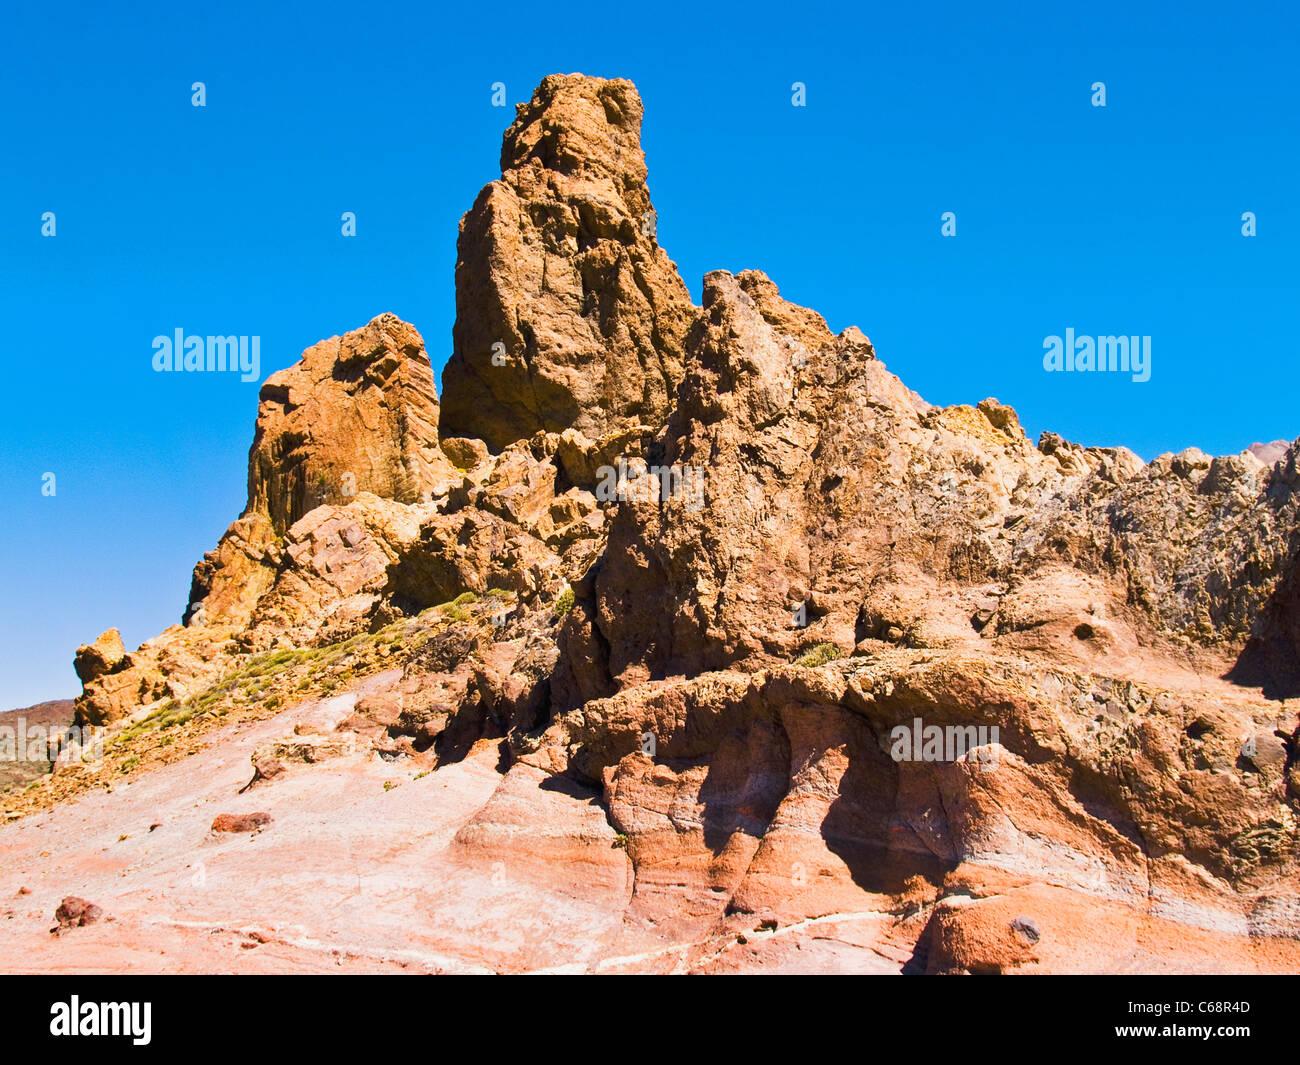 Rock im Teide Nationalpark Teneriffa, Kanarische Inseln-Spanien-Europa Stockbild